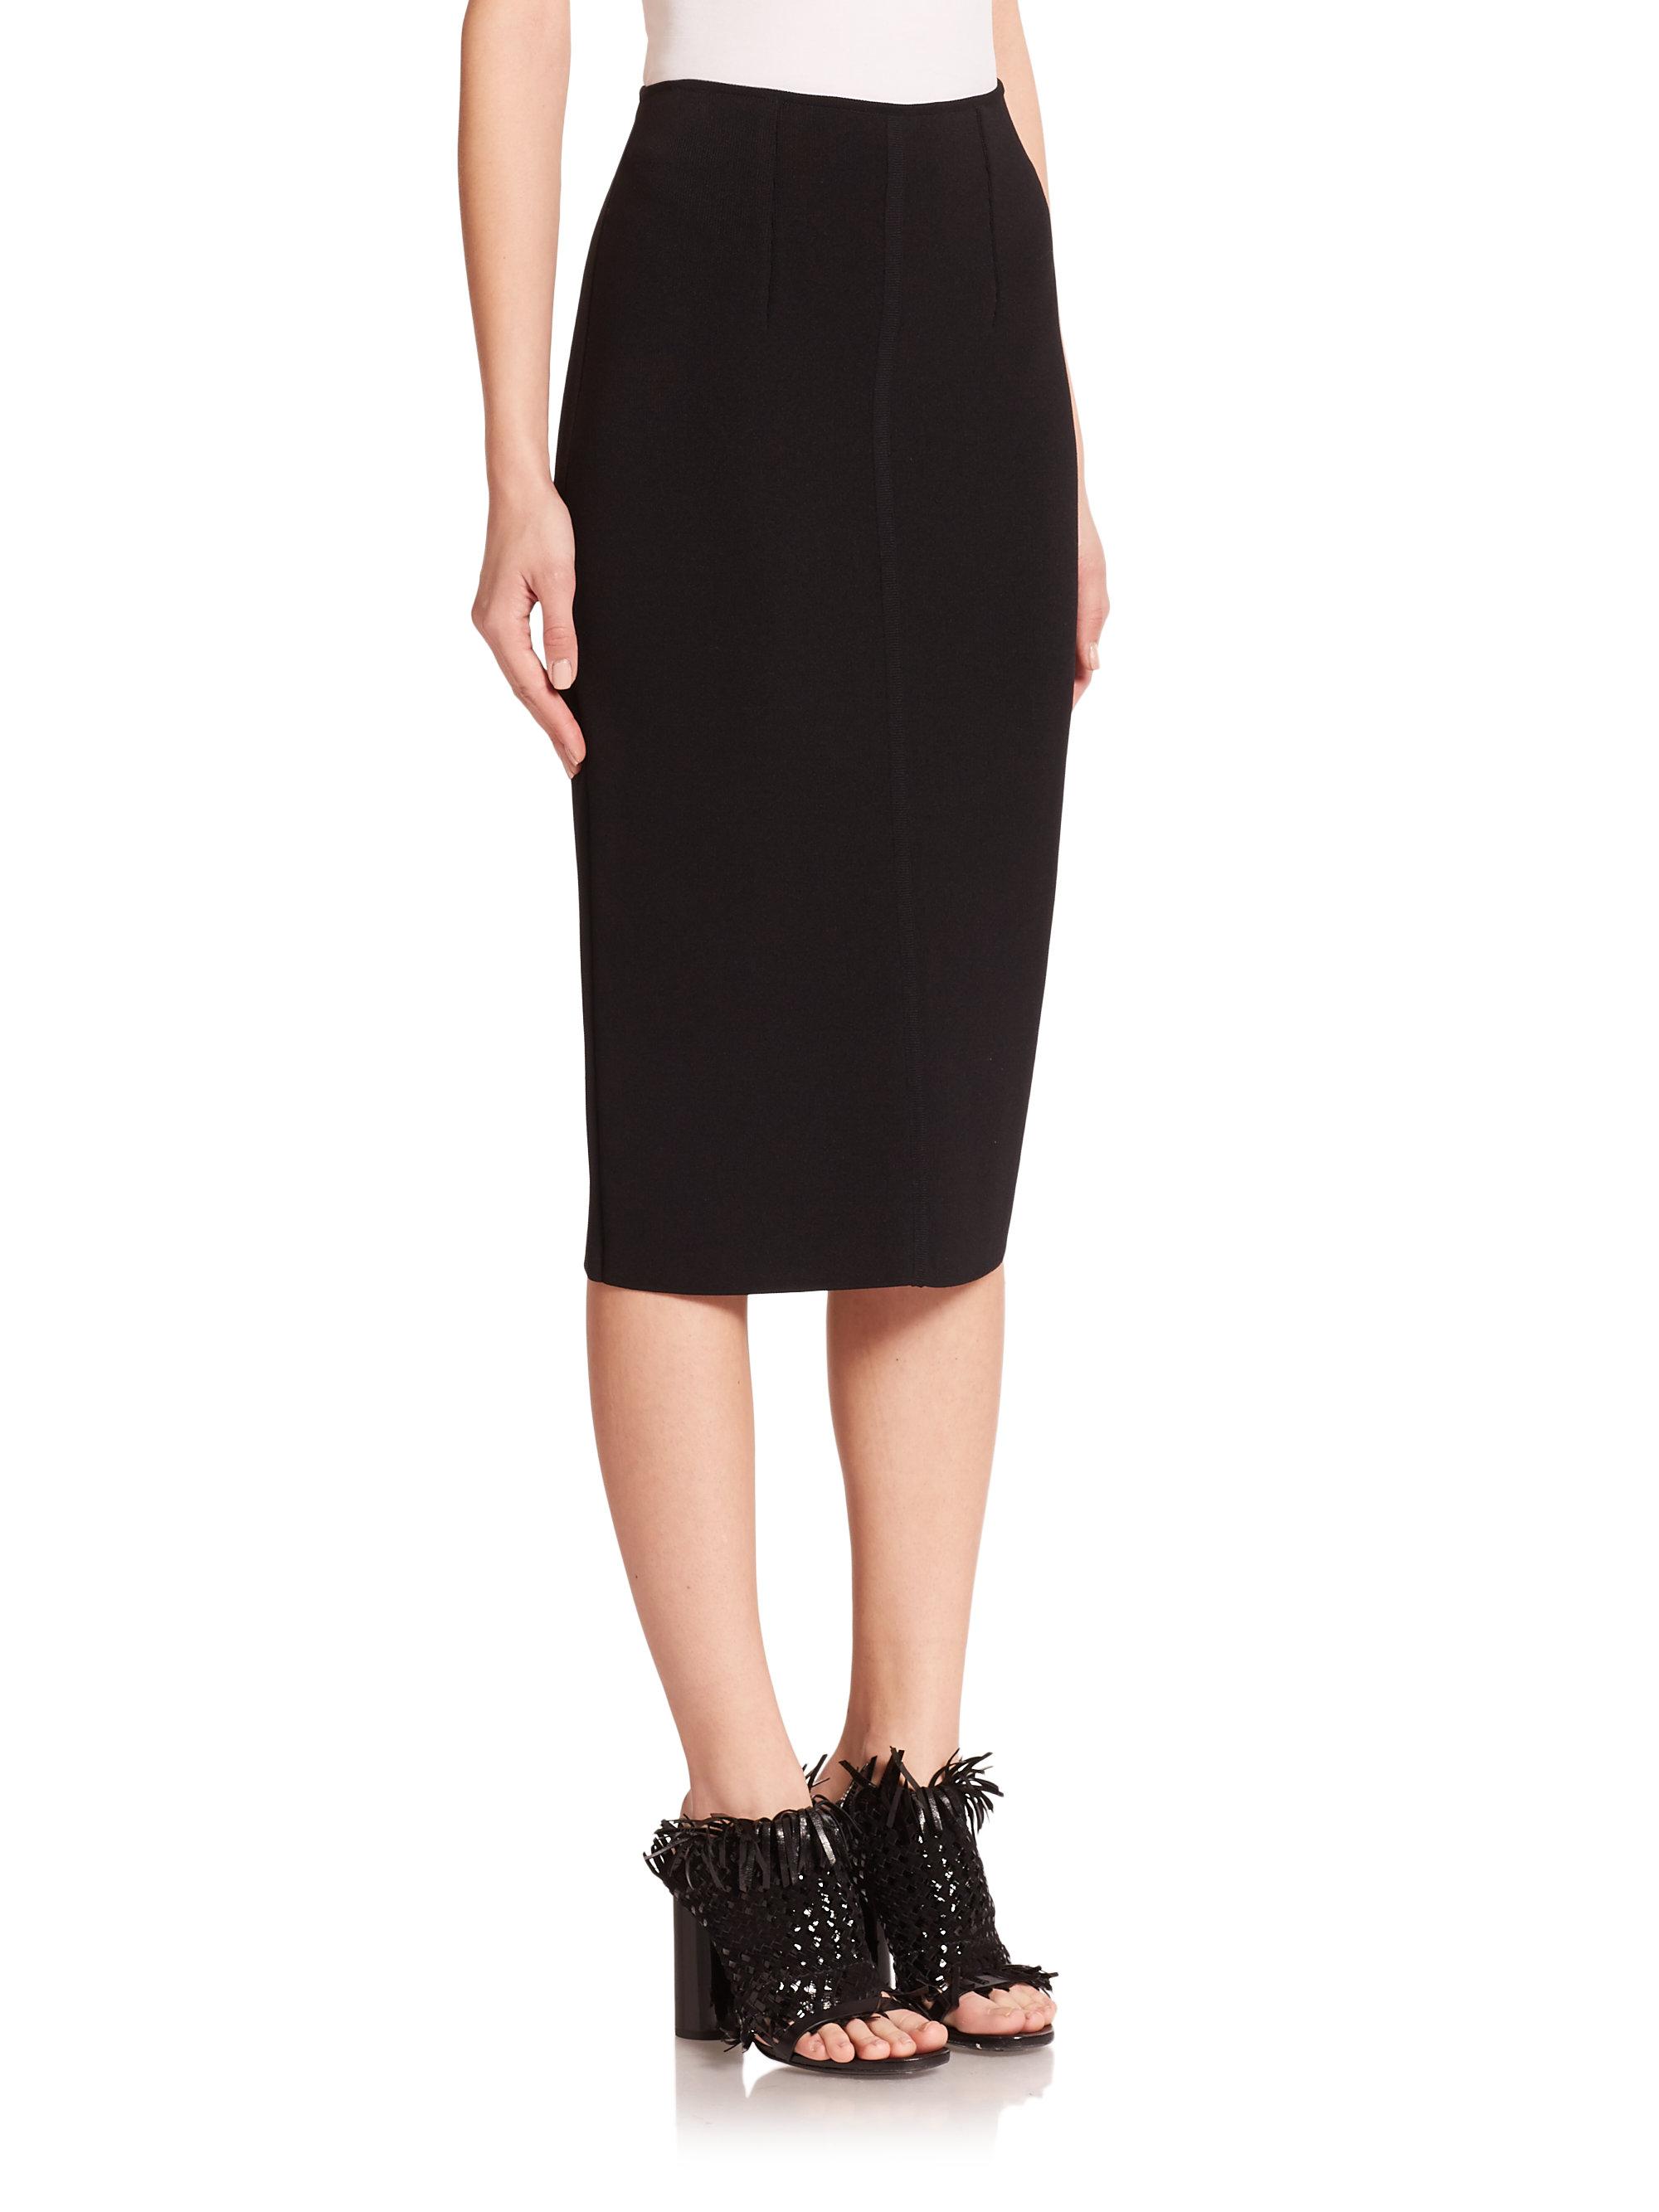 9685bc0b8 Proenza Schouler Knit Pencil Skirt in Black - Lyst